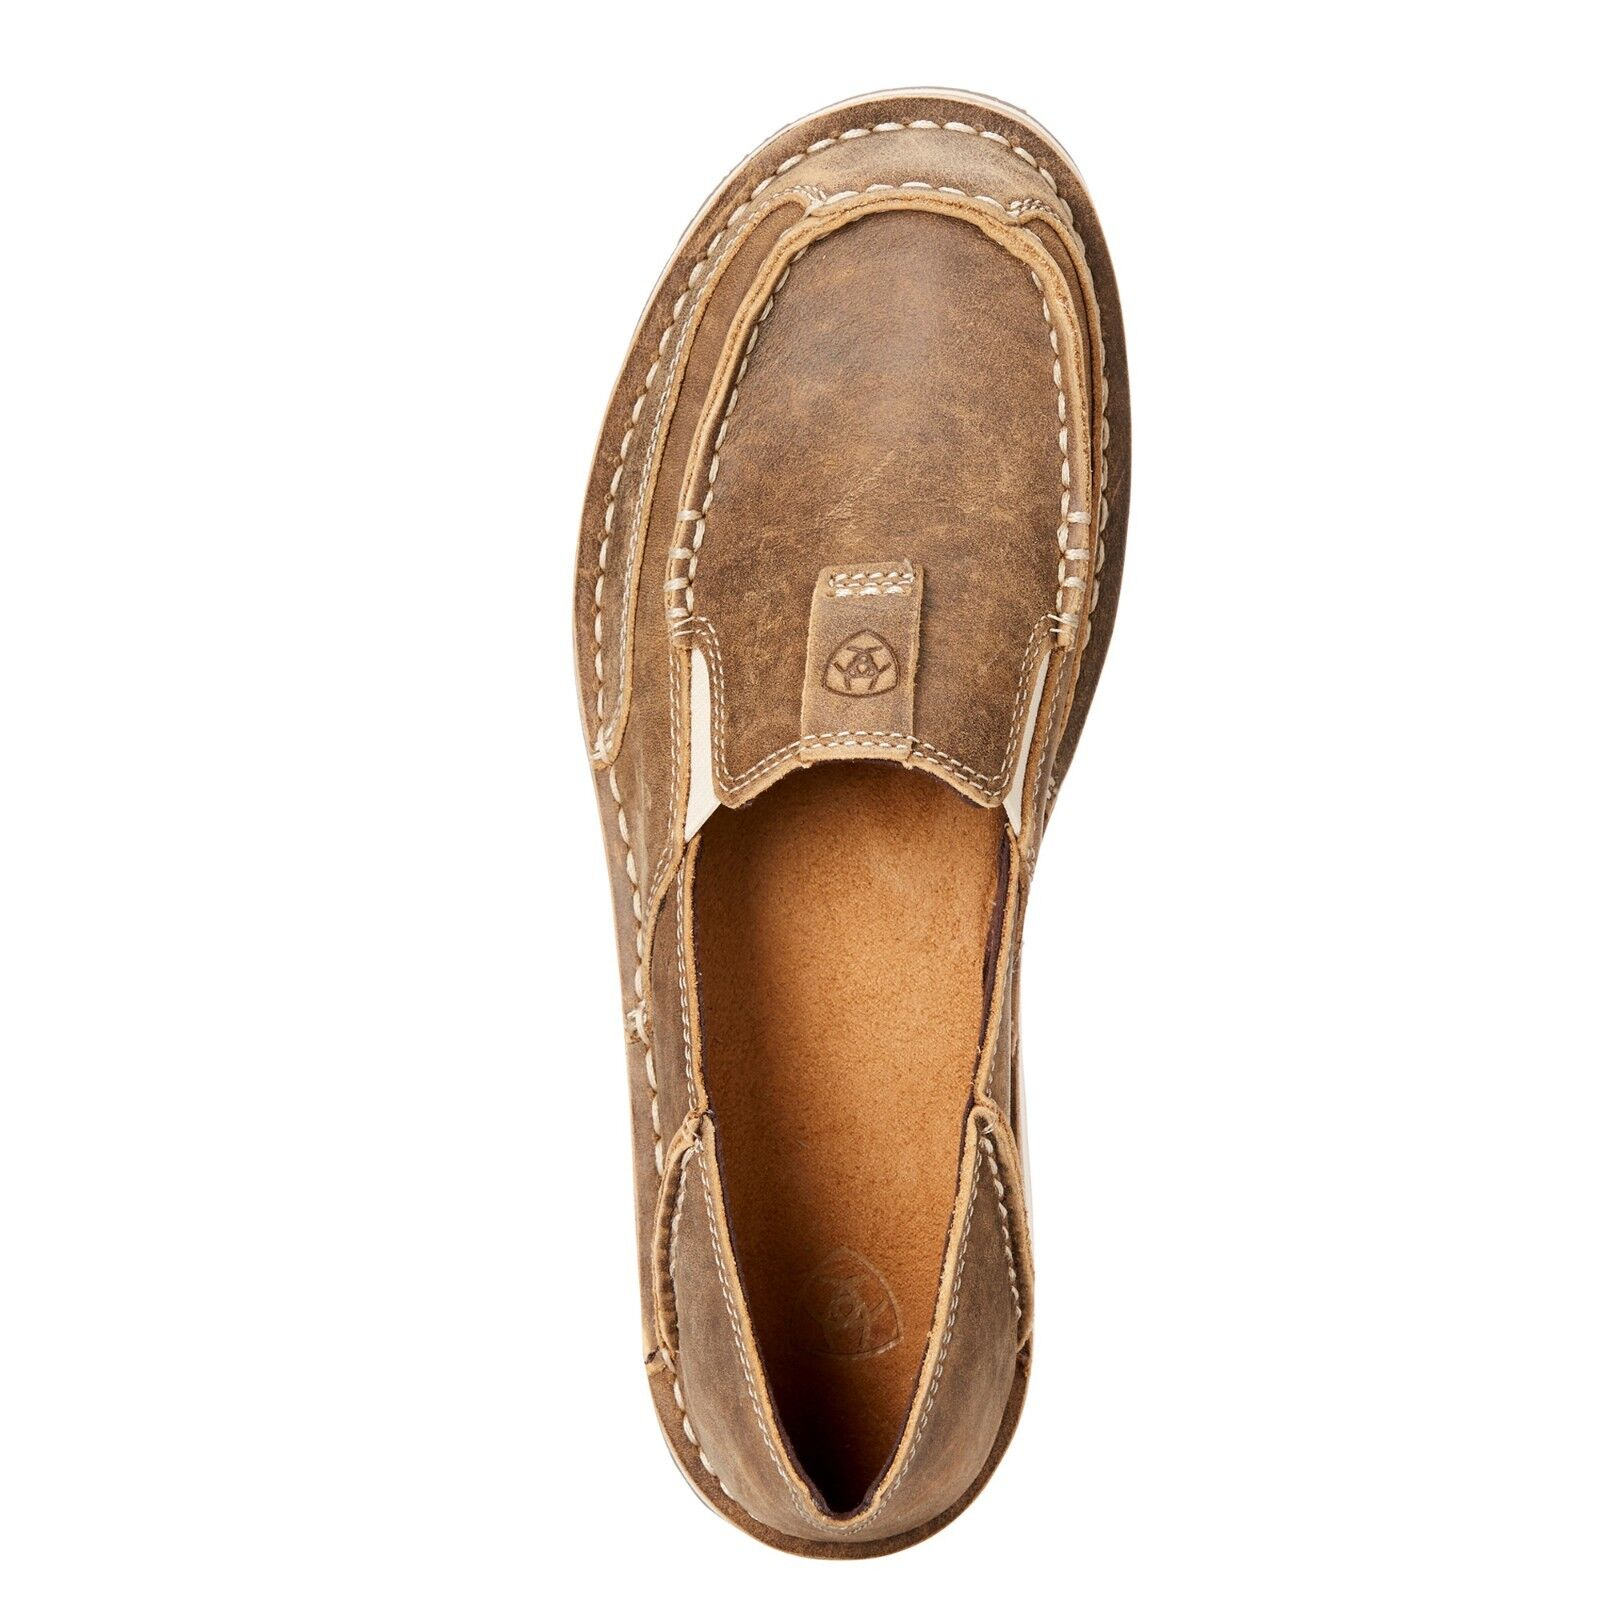 Ariat® Ladies Cruiser Bomber Bomber Bomber Brown shoes 10023008 981008